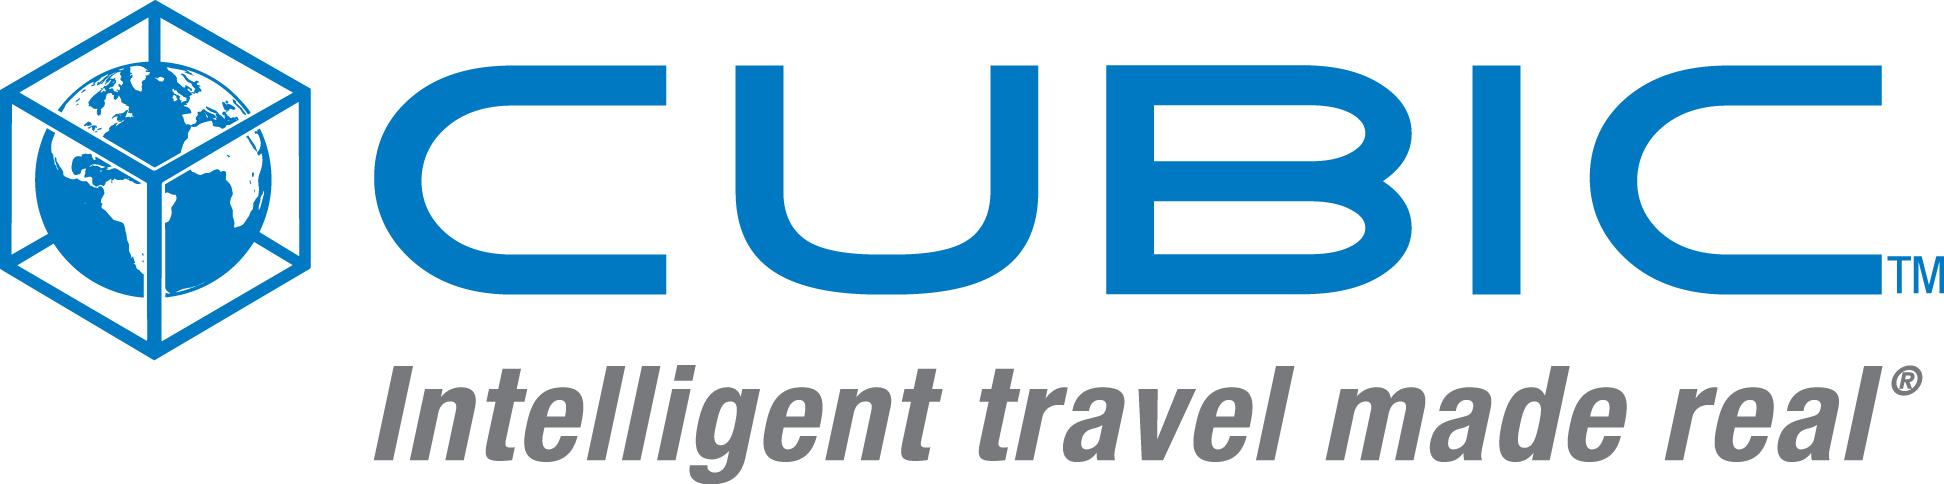 new-cubic-logo-pms300-cts-slogan.jpg